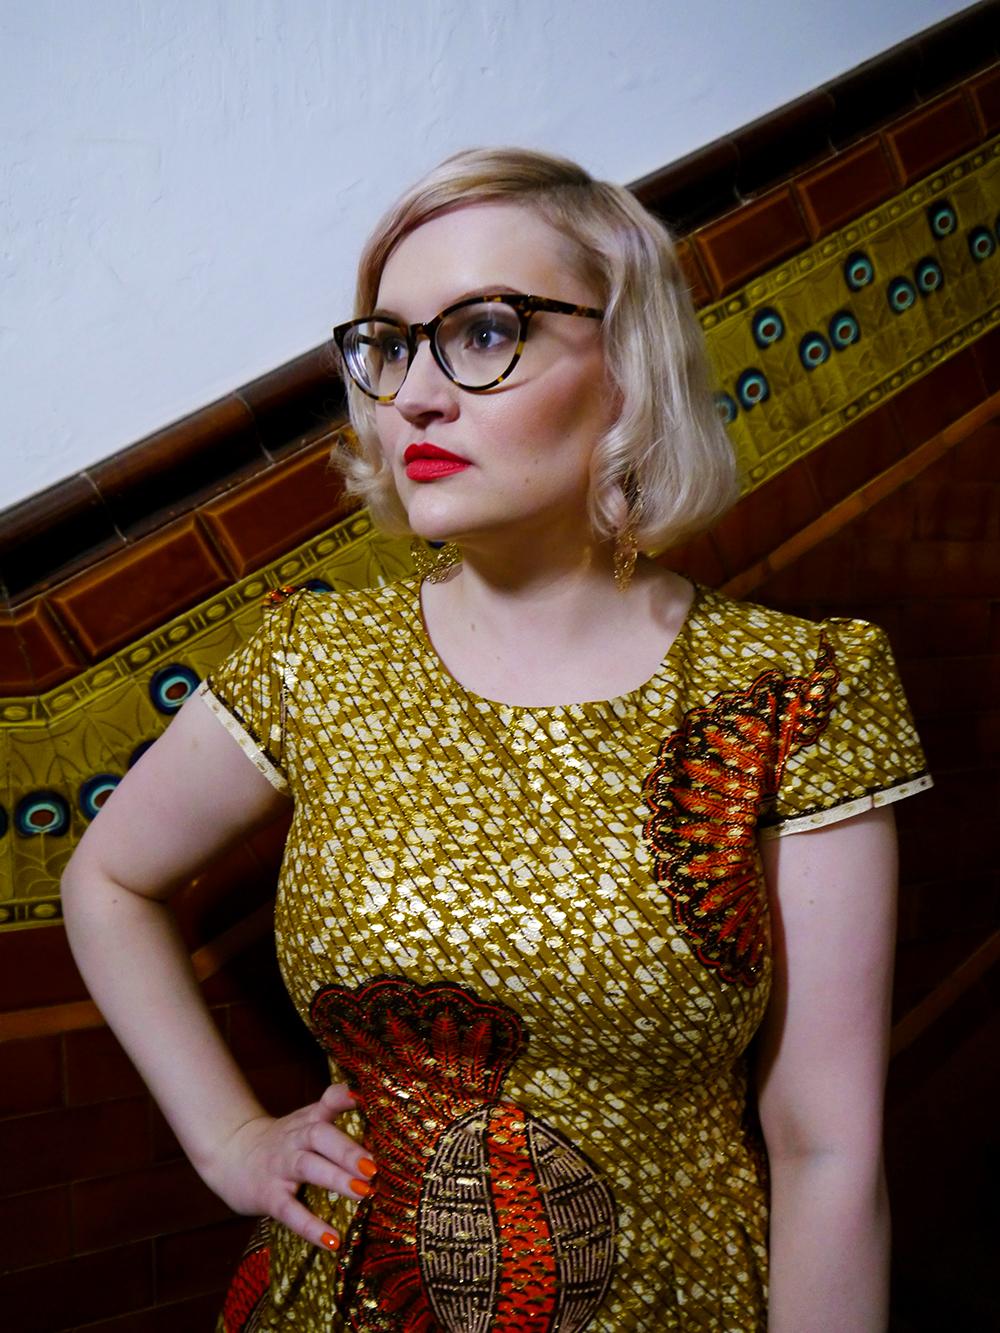 Rowanjoy, red lip, femme fatale, Herald Fashion Awards 2015, modern pincurl, IOLLA Muir frames, Glasgow tenement tiles, Indian waxed cotton fabric